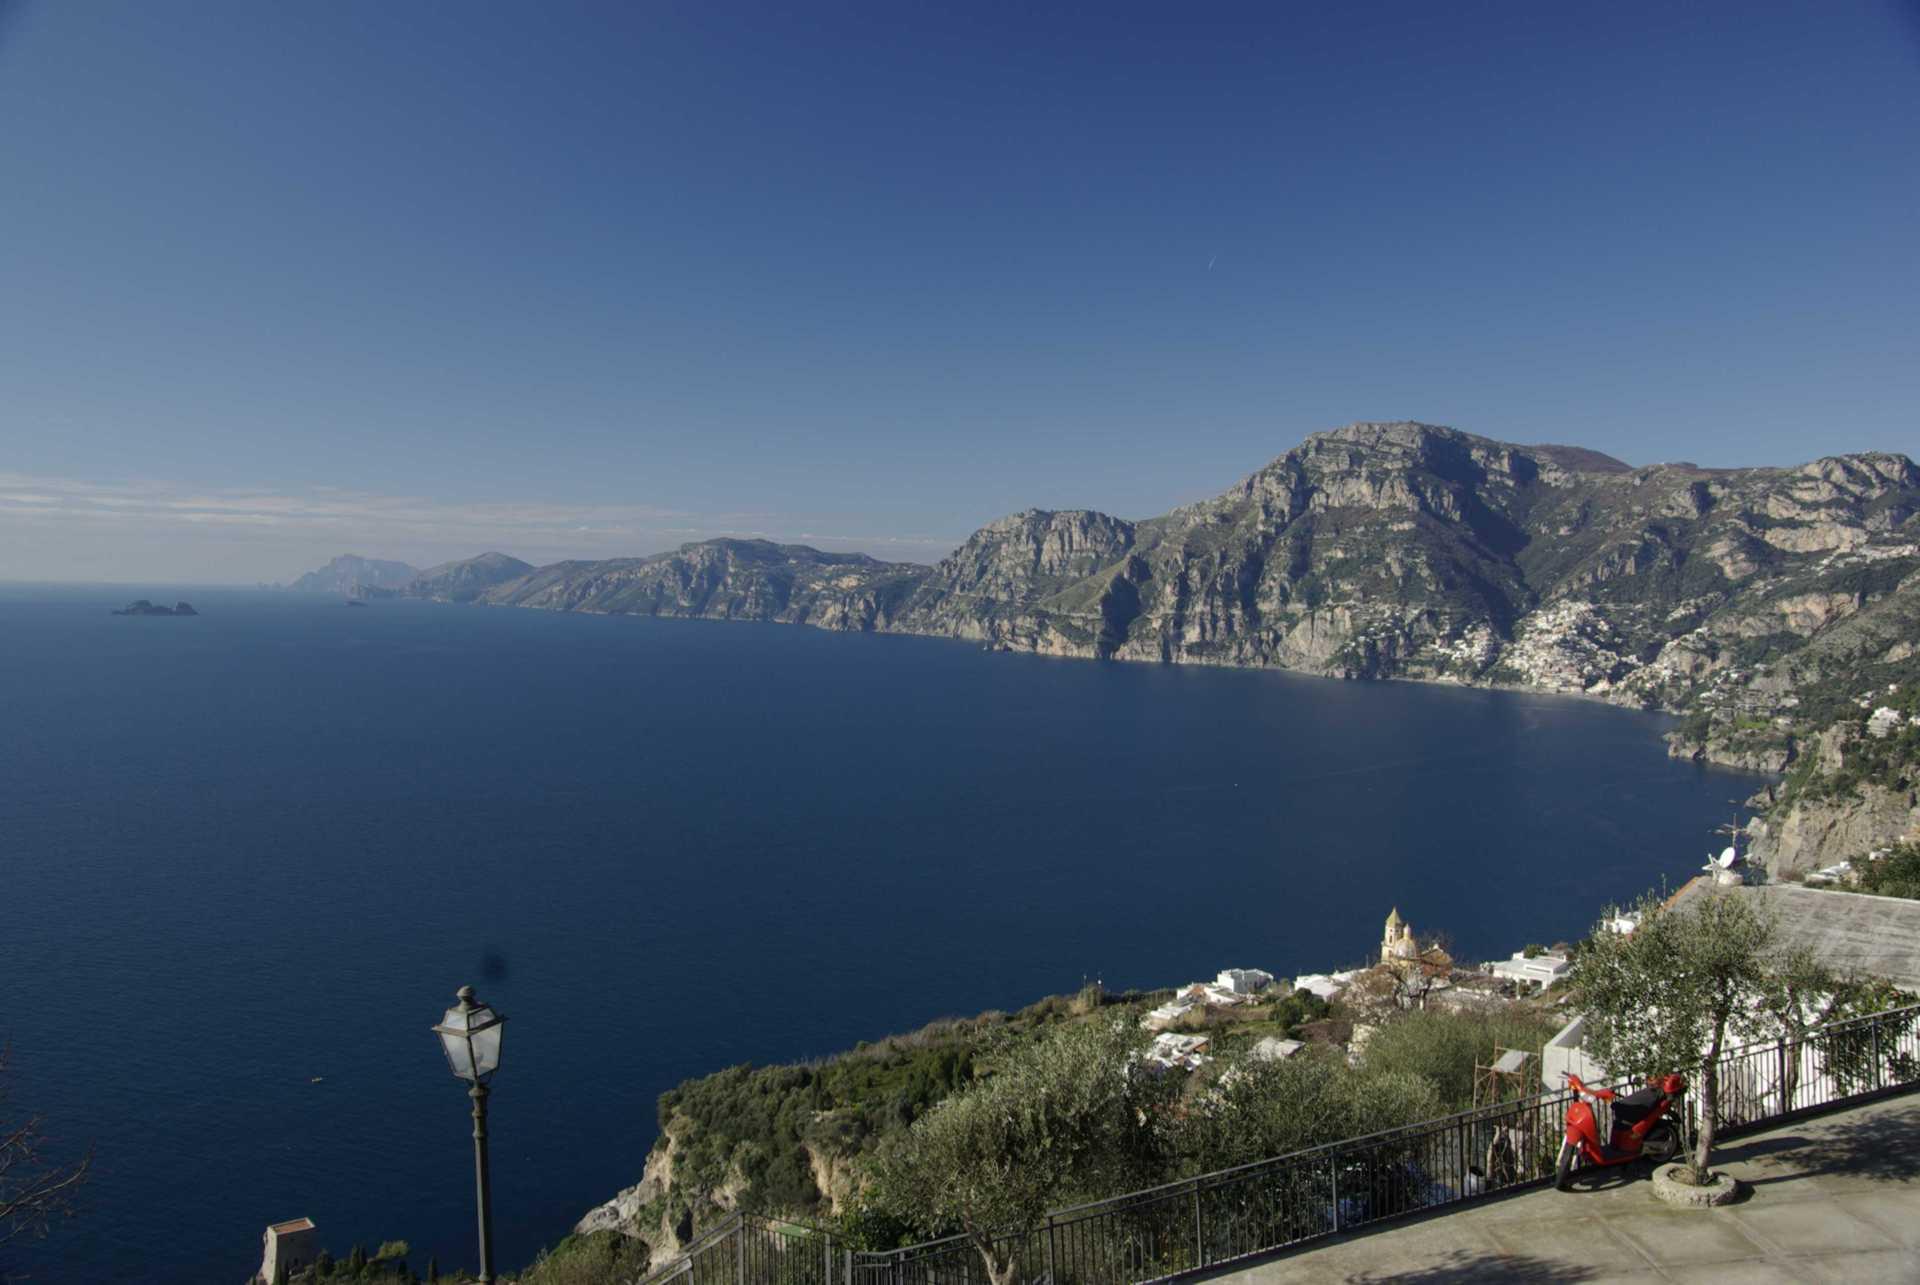 L'italia: il bel paese on emaze